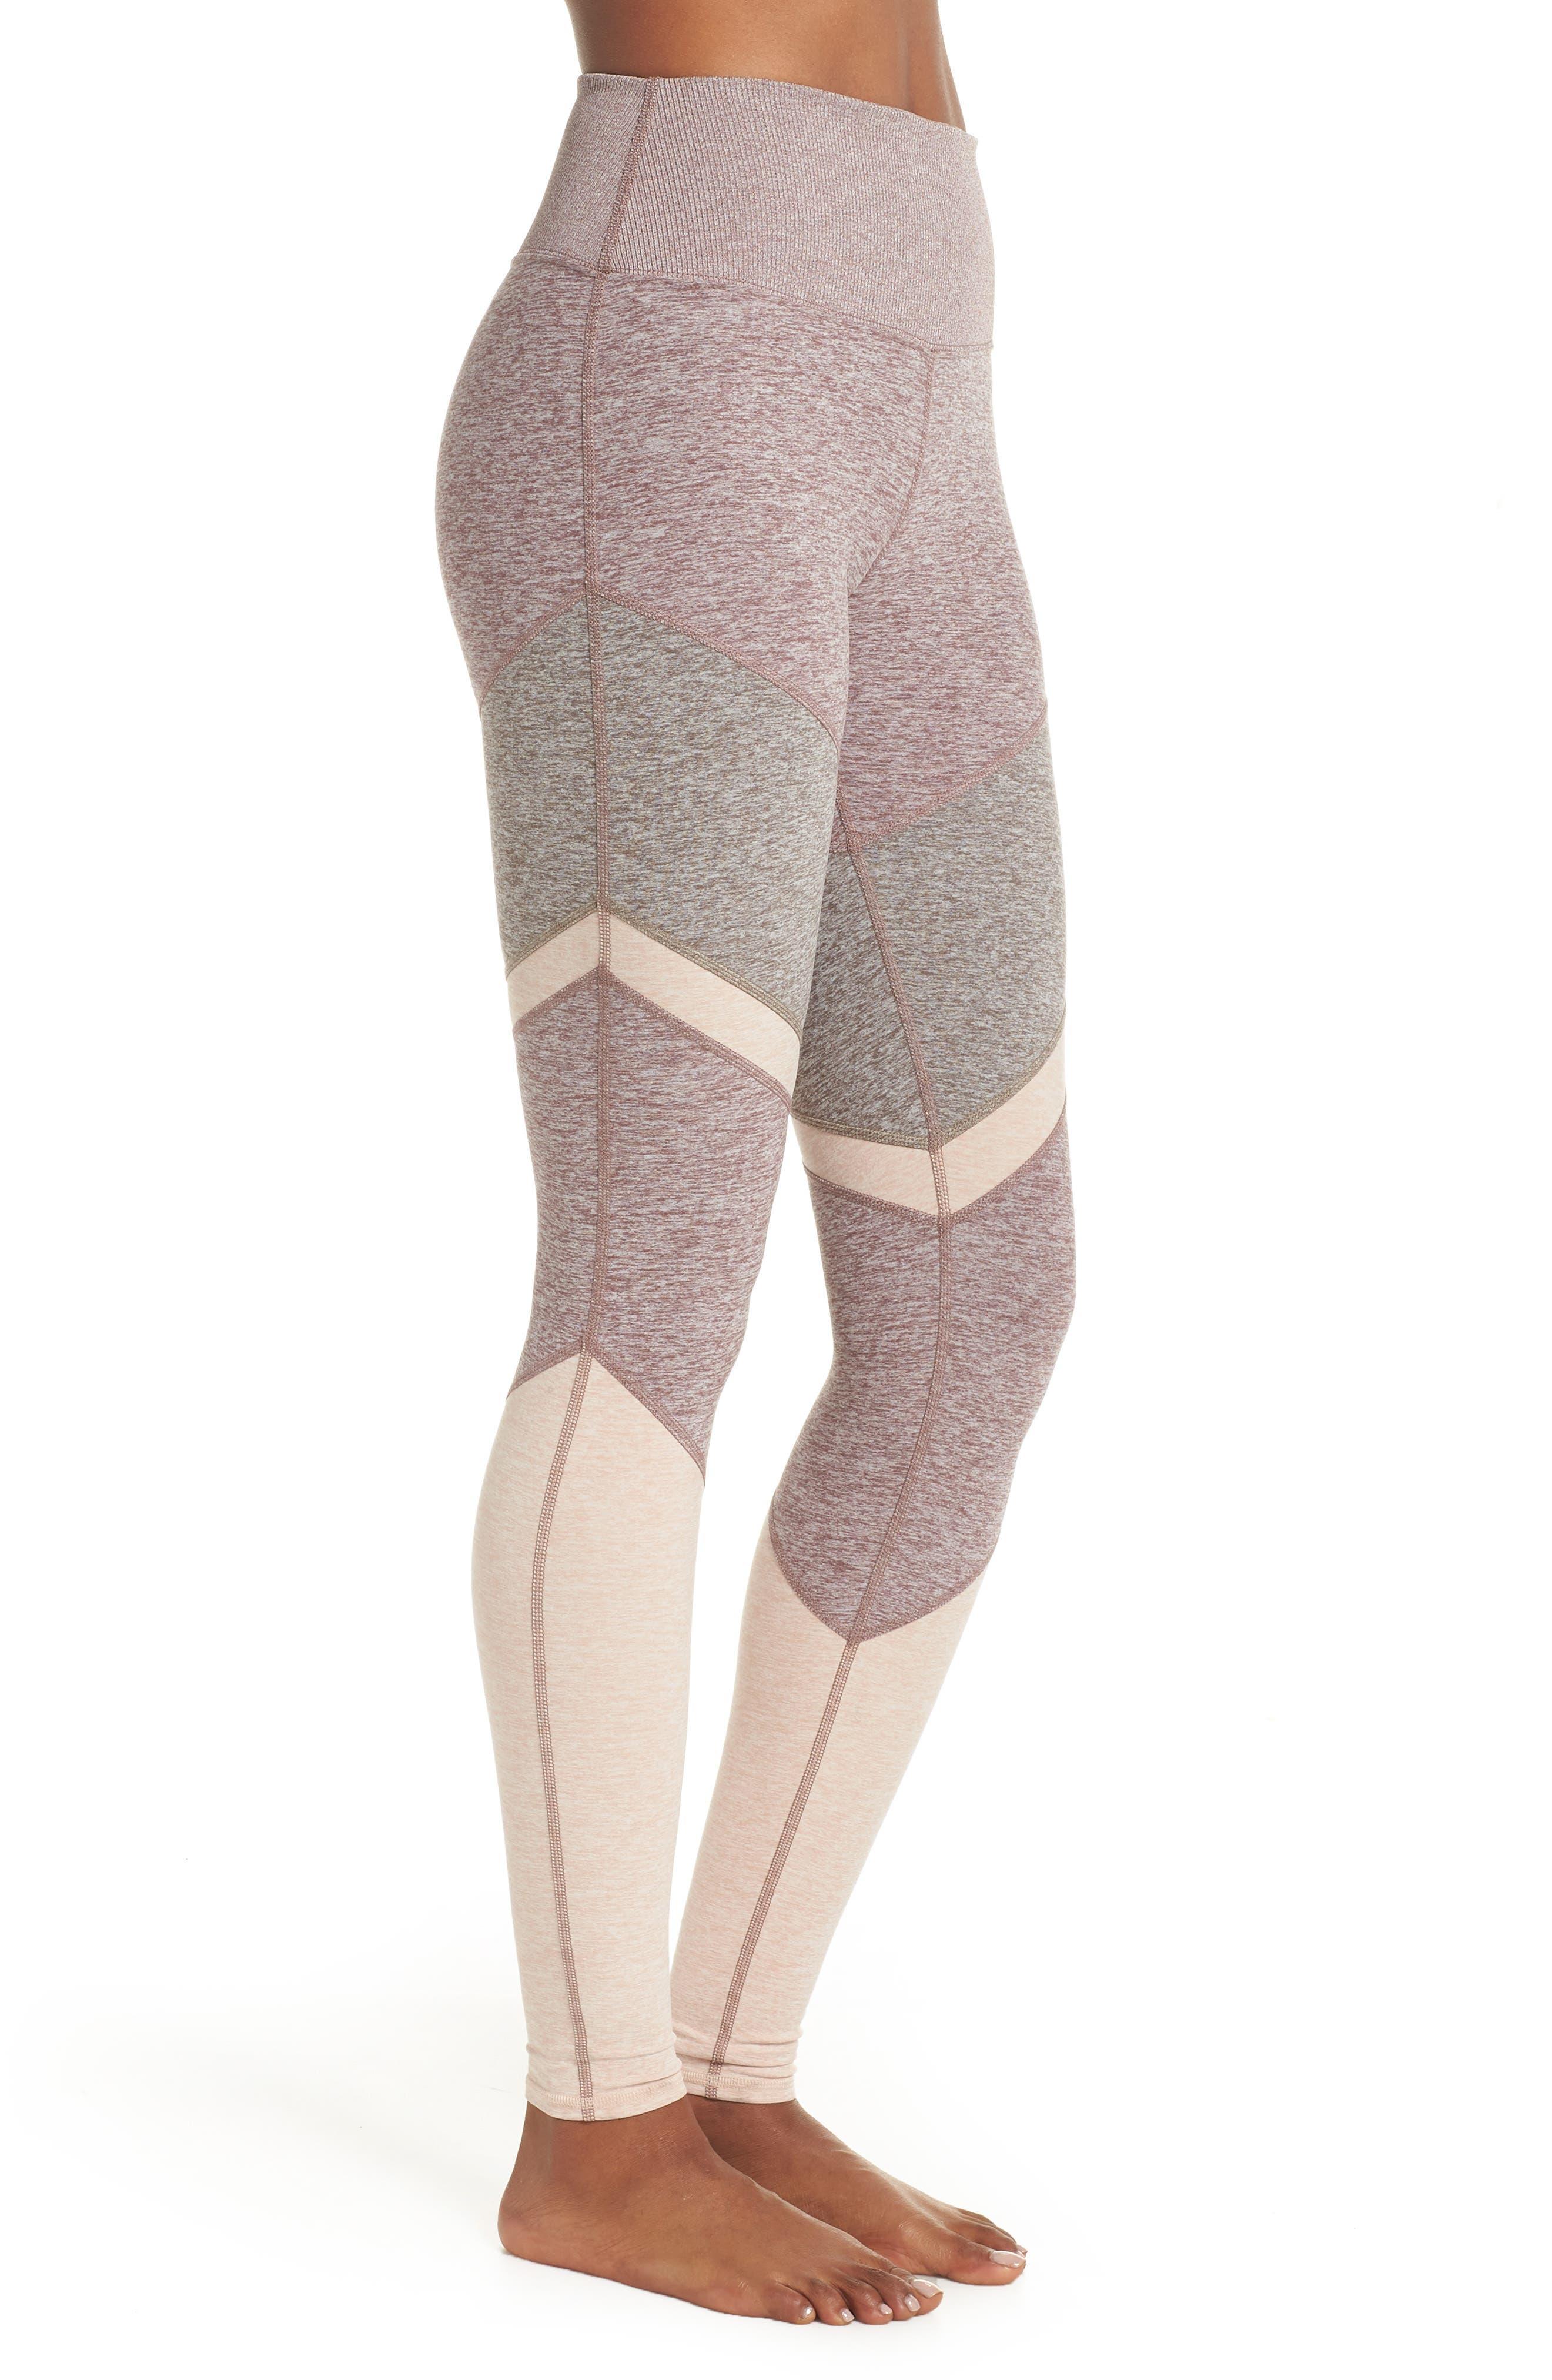 Sheila High Waist Leggings,                             Alternate thumbnail 3, color,                             SMOKY QUARTZ/ GRAVEL/ NECTAR